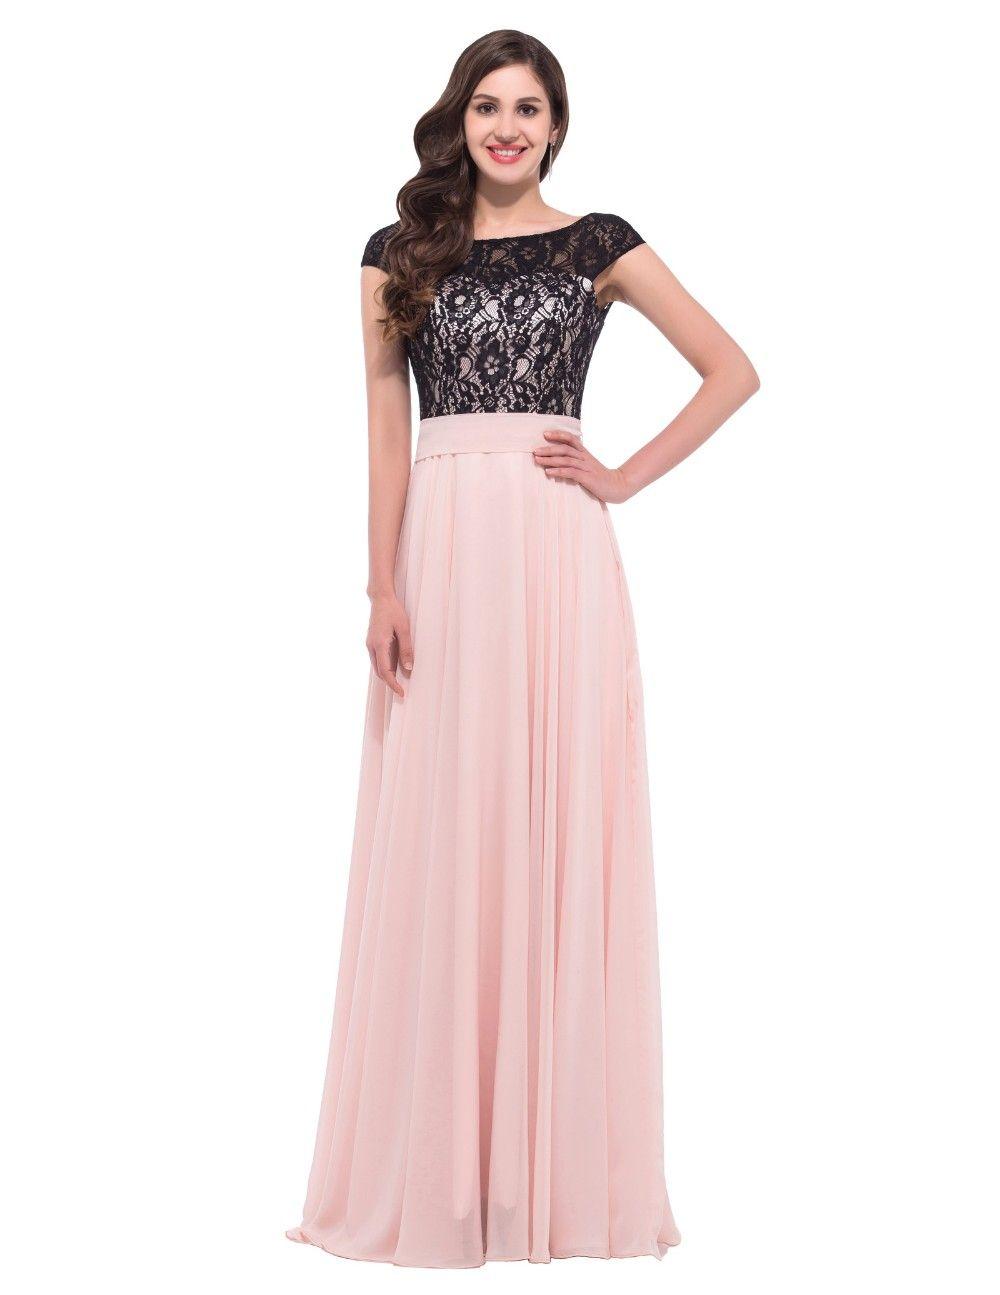 Pin by alyssa jane on long formal gowns pinterest long formal